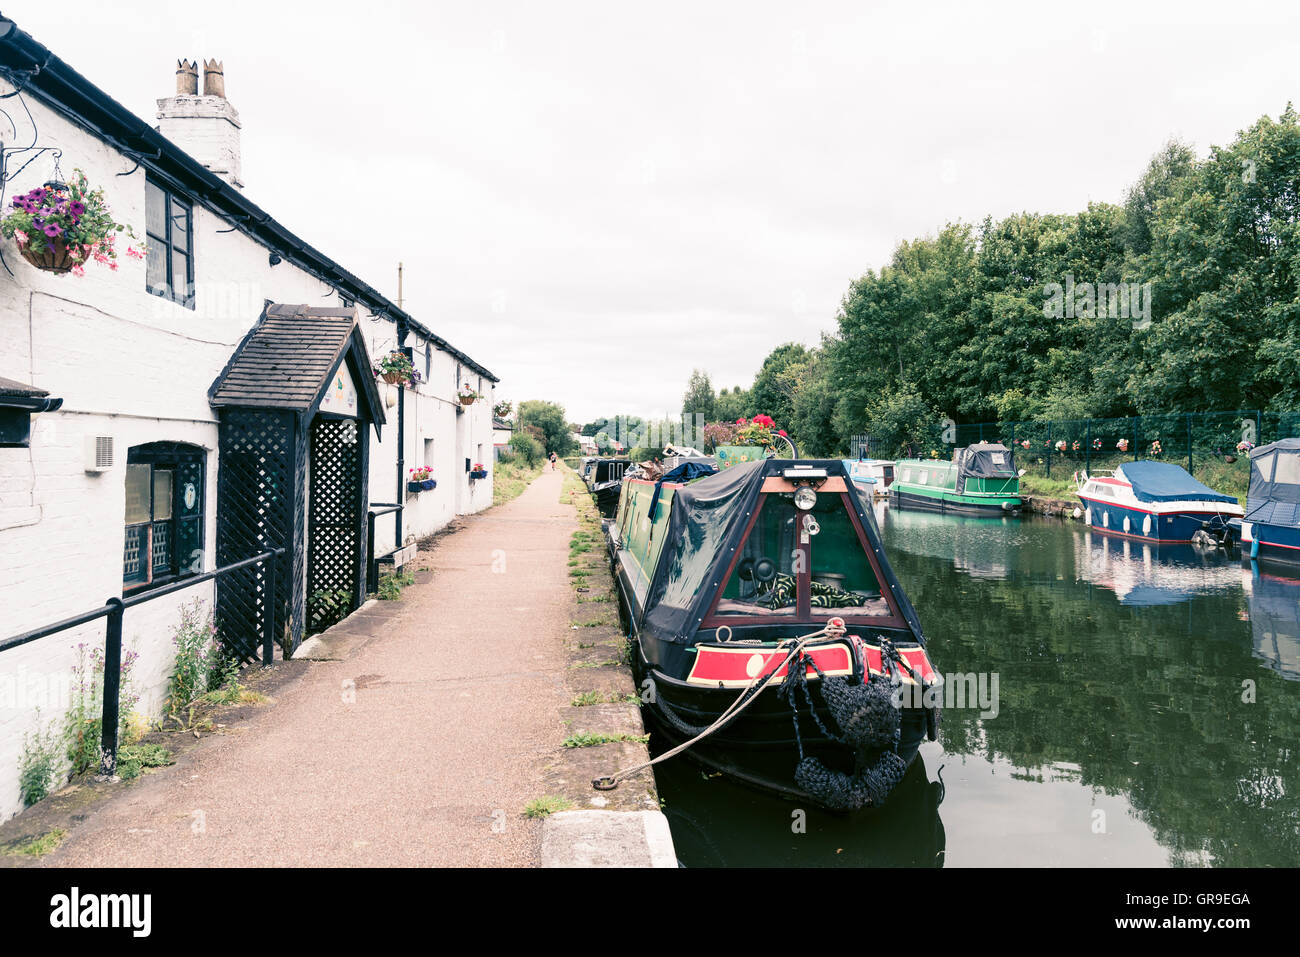 Watch House Cruising Club, Bridgewater Canal, Stretford, Manchester. - Stock Image